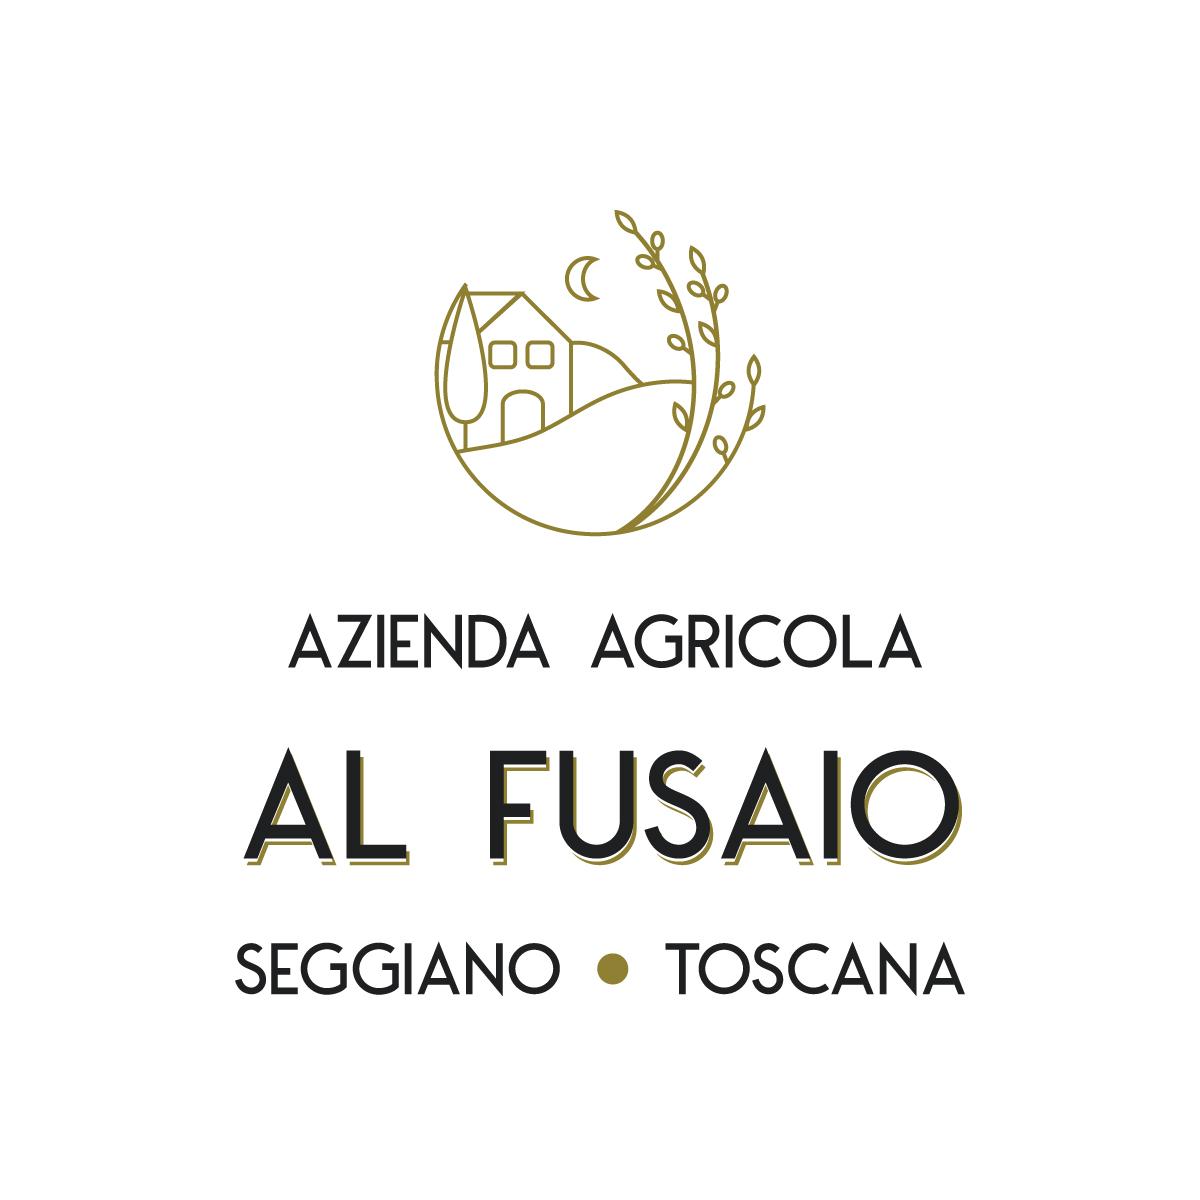 Logo Design azienda agricola al fusaio